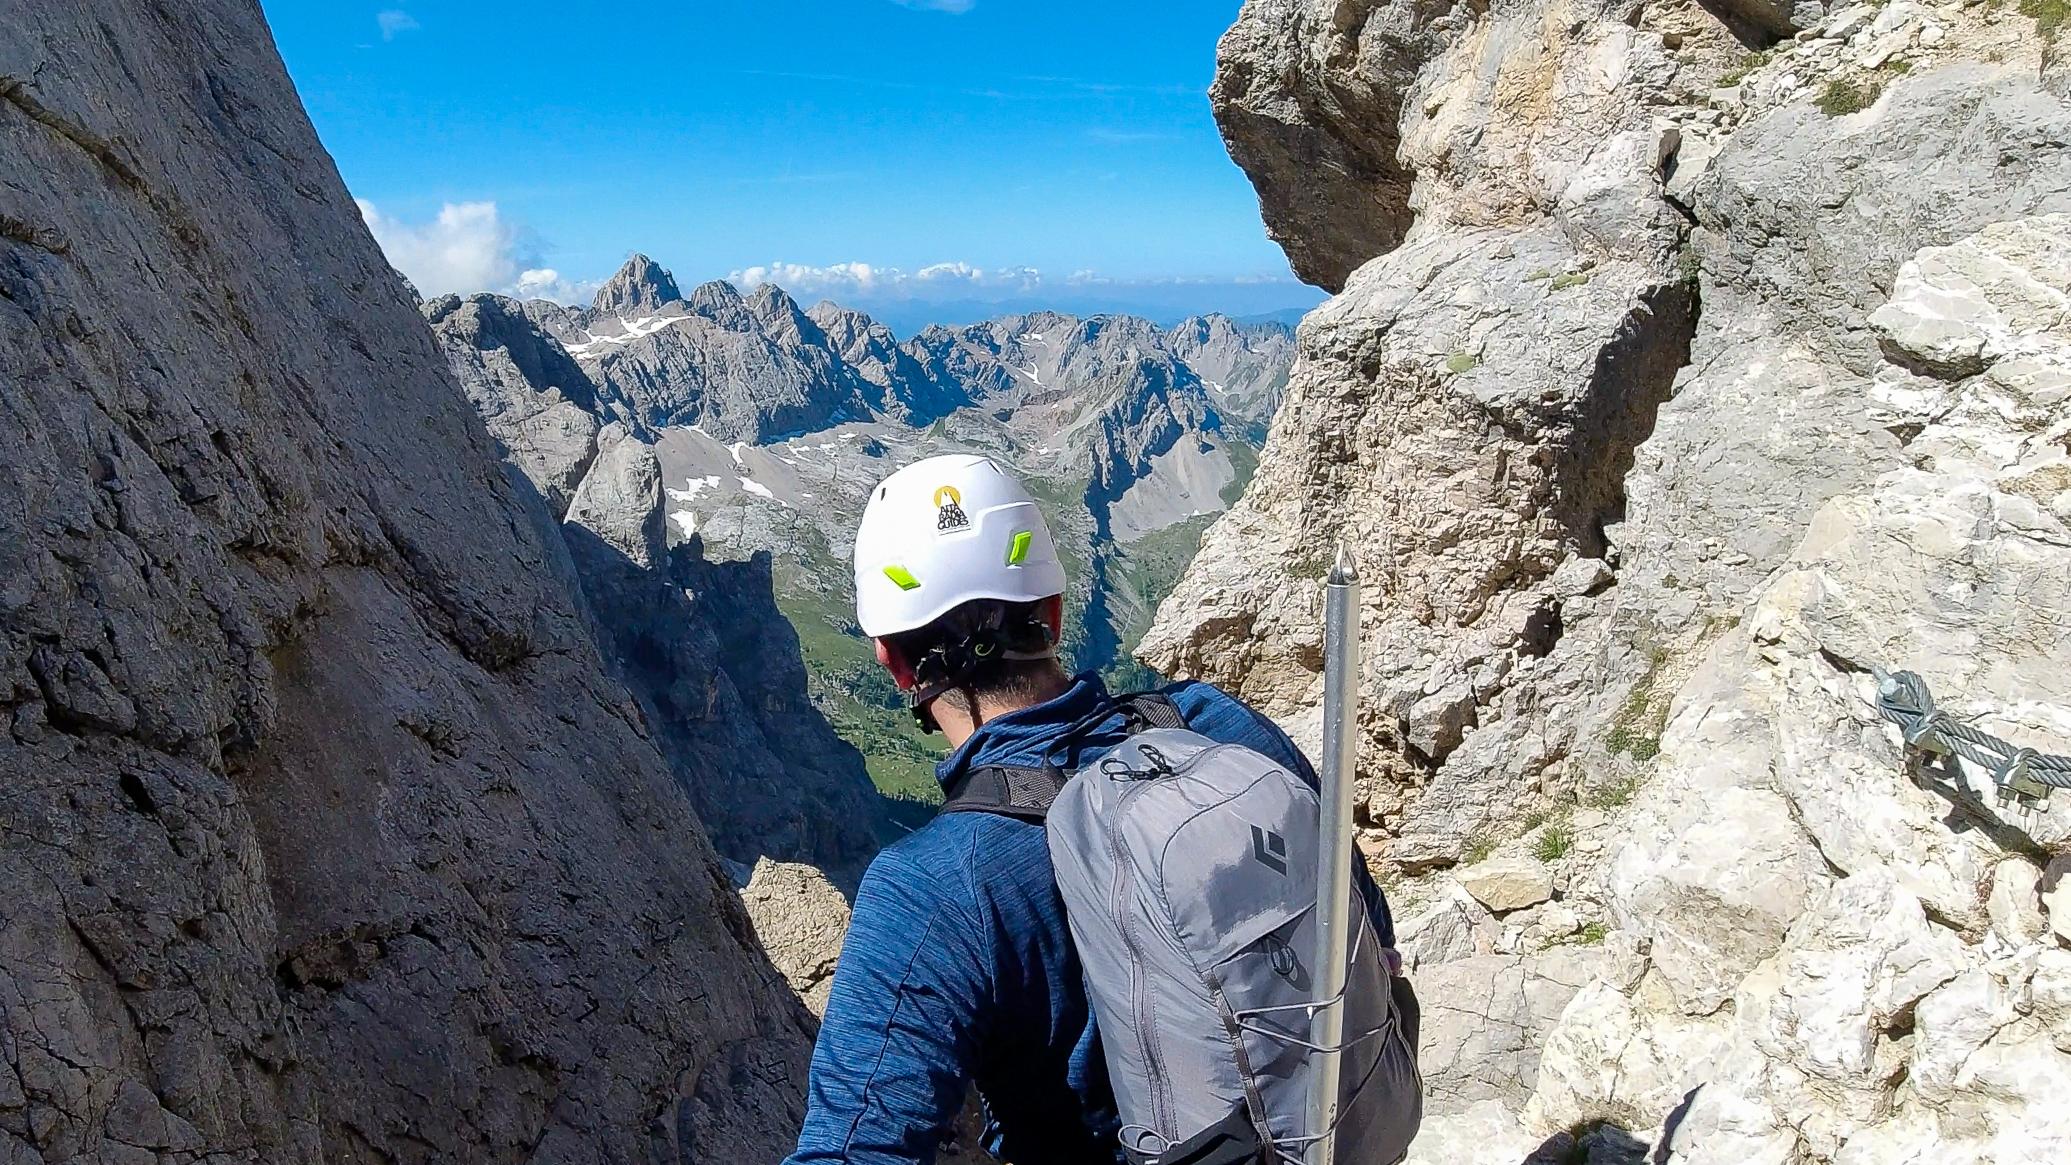 Vestryggen opp Marmolada har en utrolig utsikt i alle retninger.